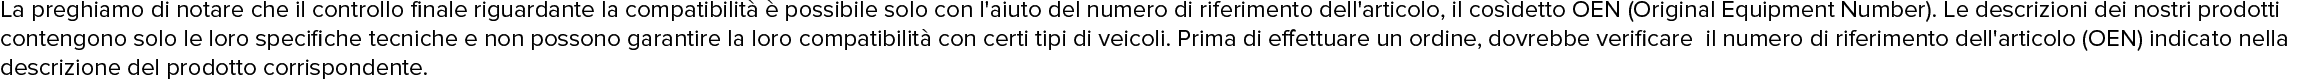 MANN-FILTER 72516587, 402040222, 489789800, Z489789800, 87803261 Filtro olio